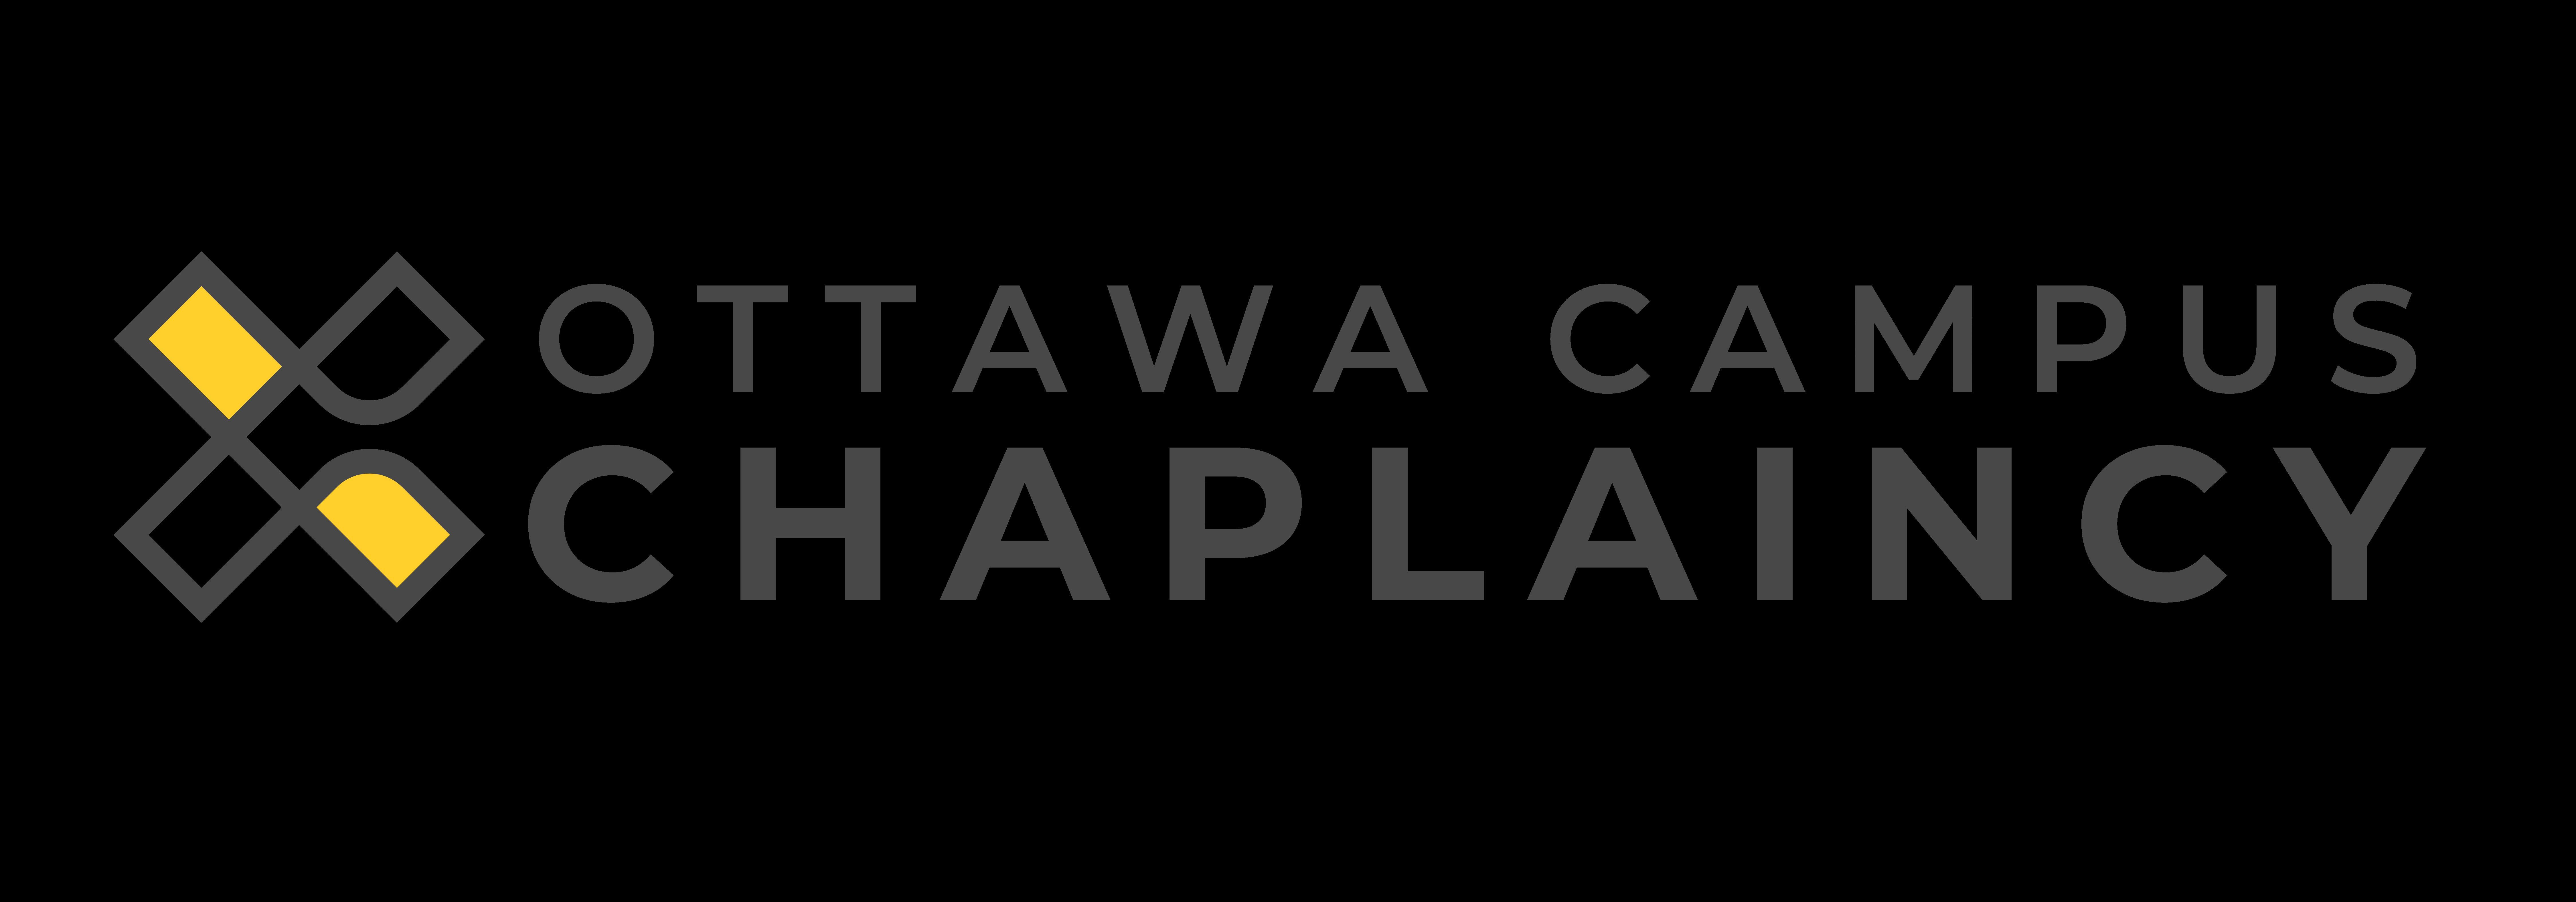 Ottawa Campus Chaplaincy